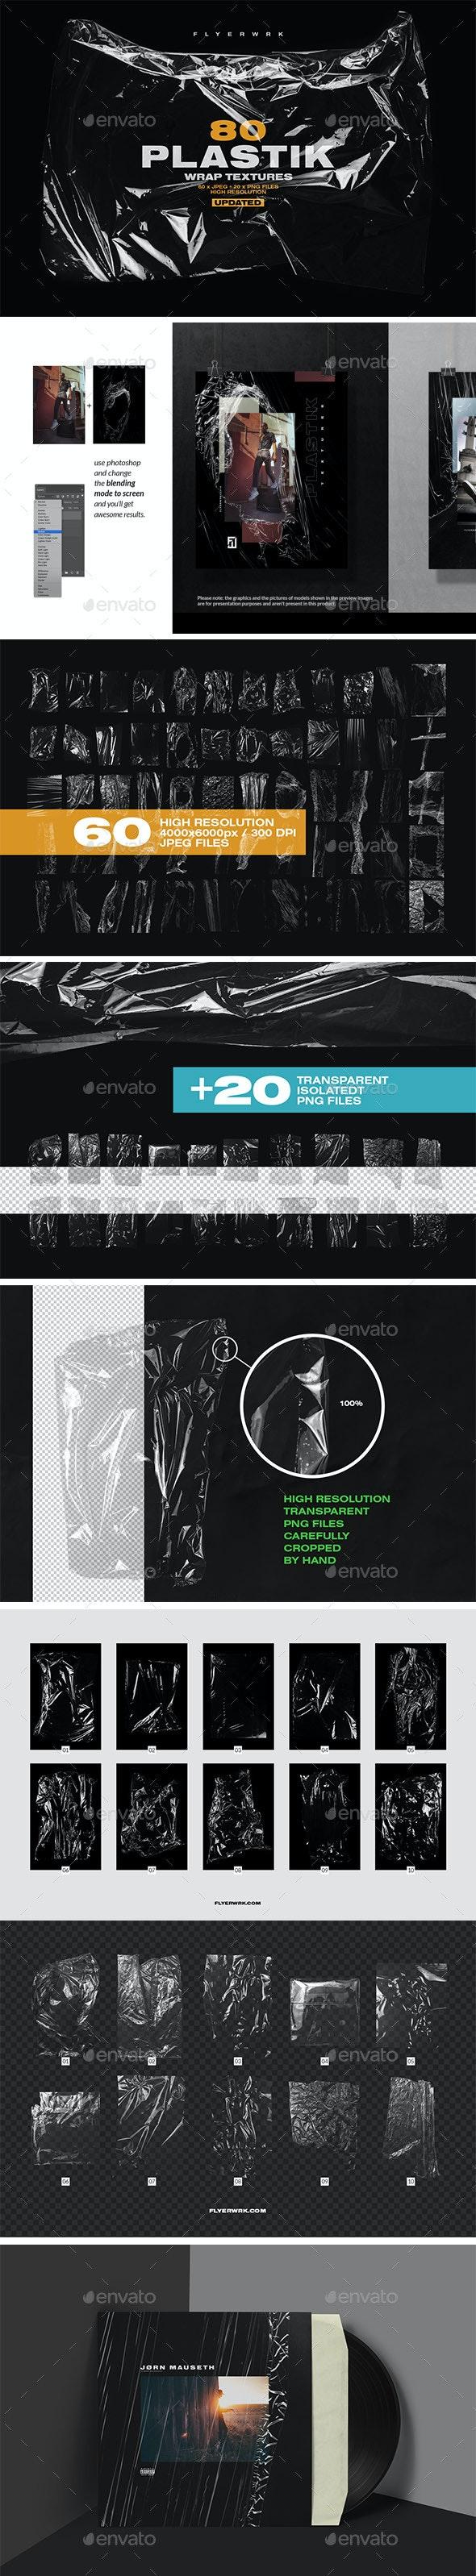 80 Plastic Wrap Textures - Miscellaneous Textures